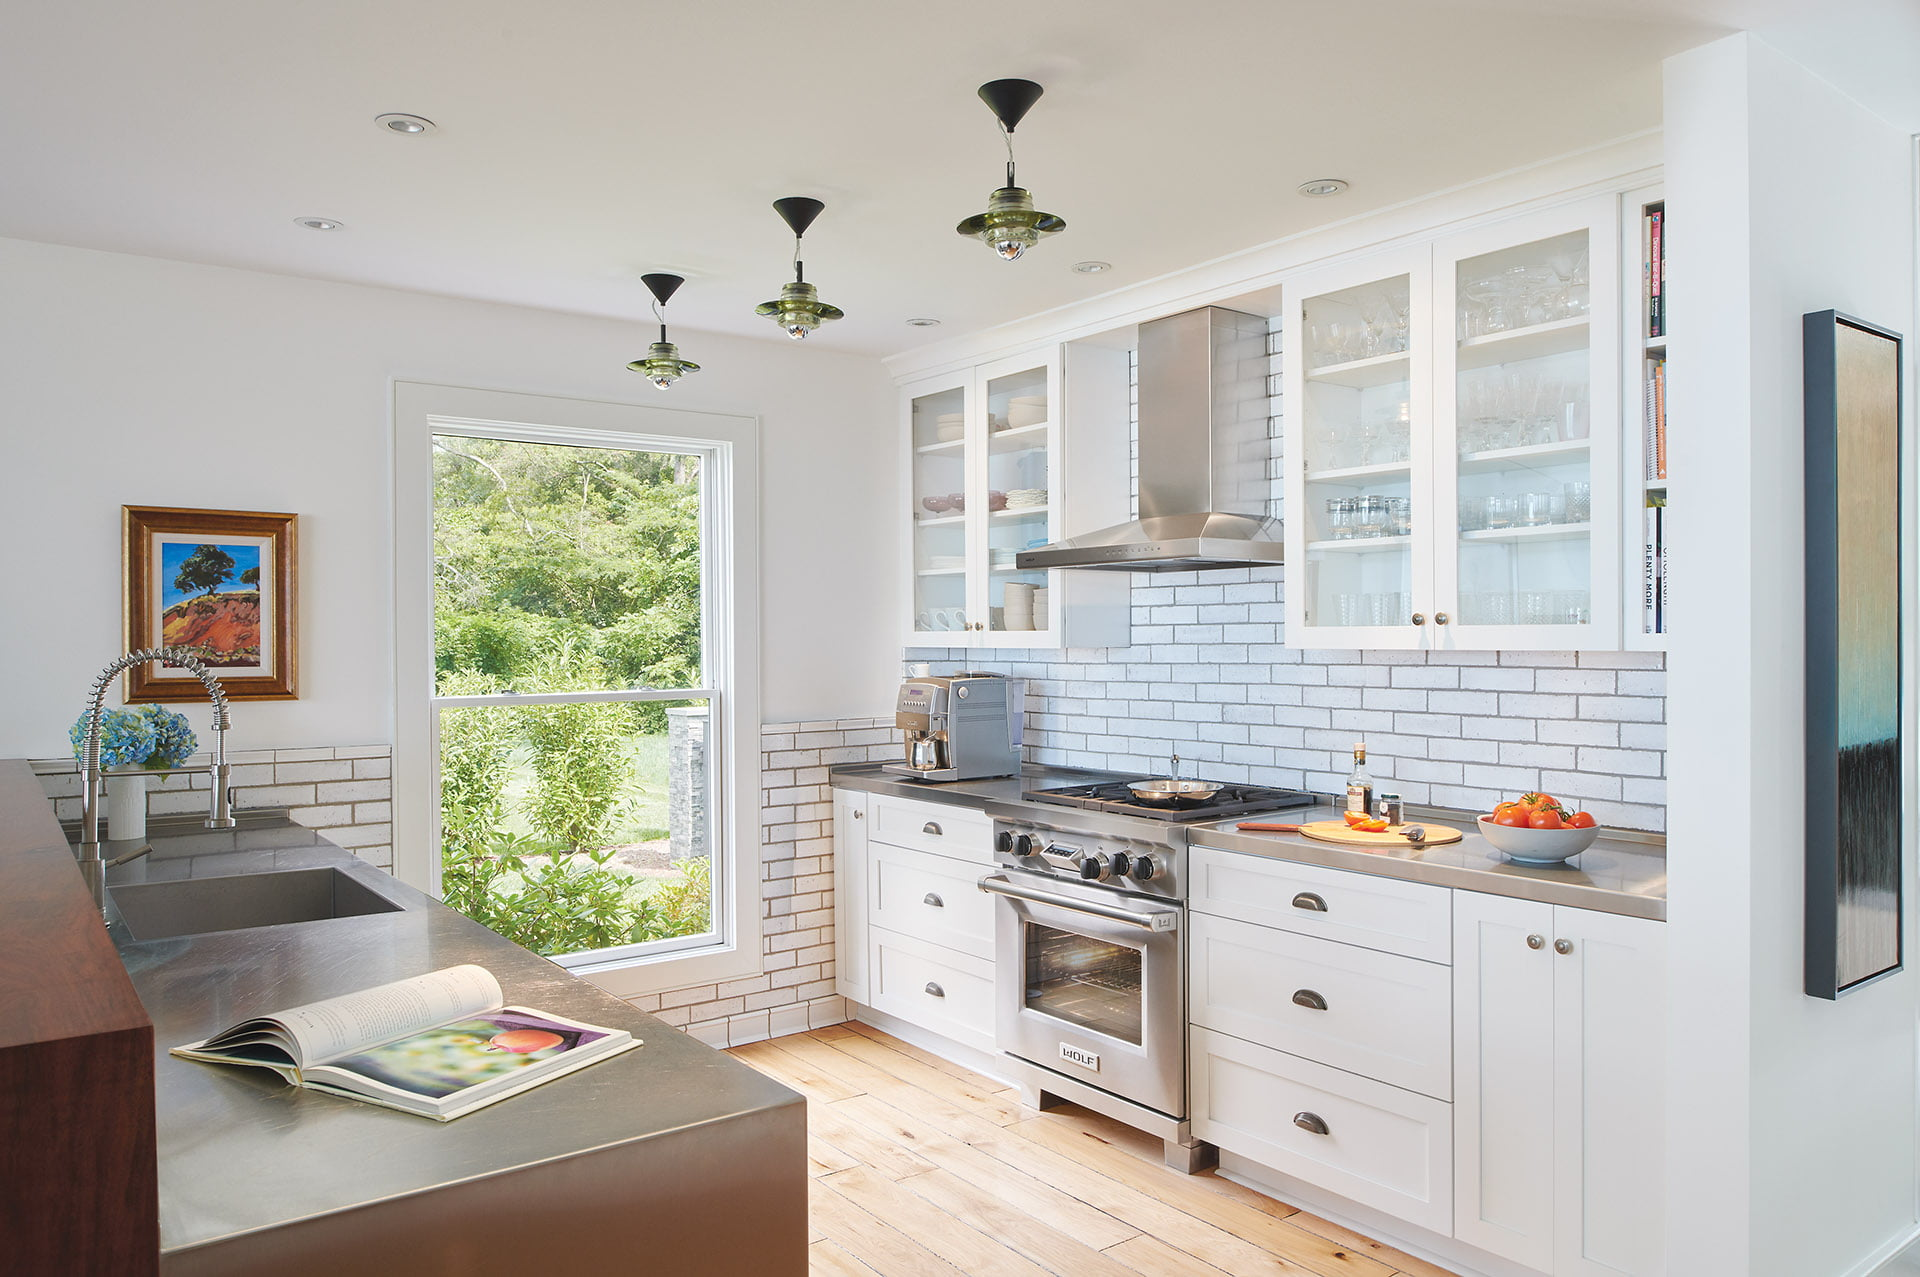 Stainless-steel kitchen countertops